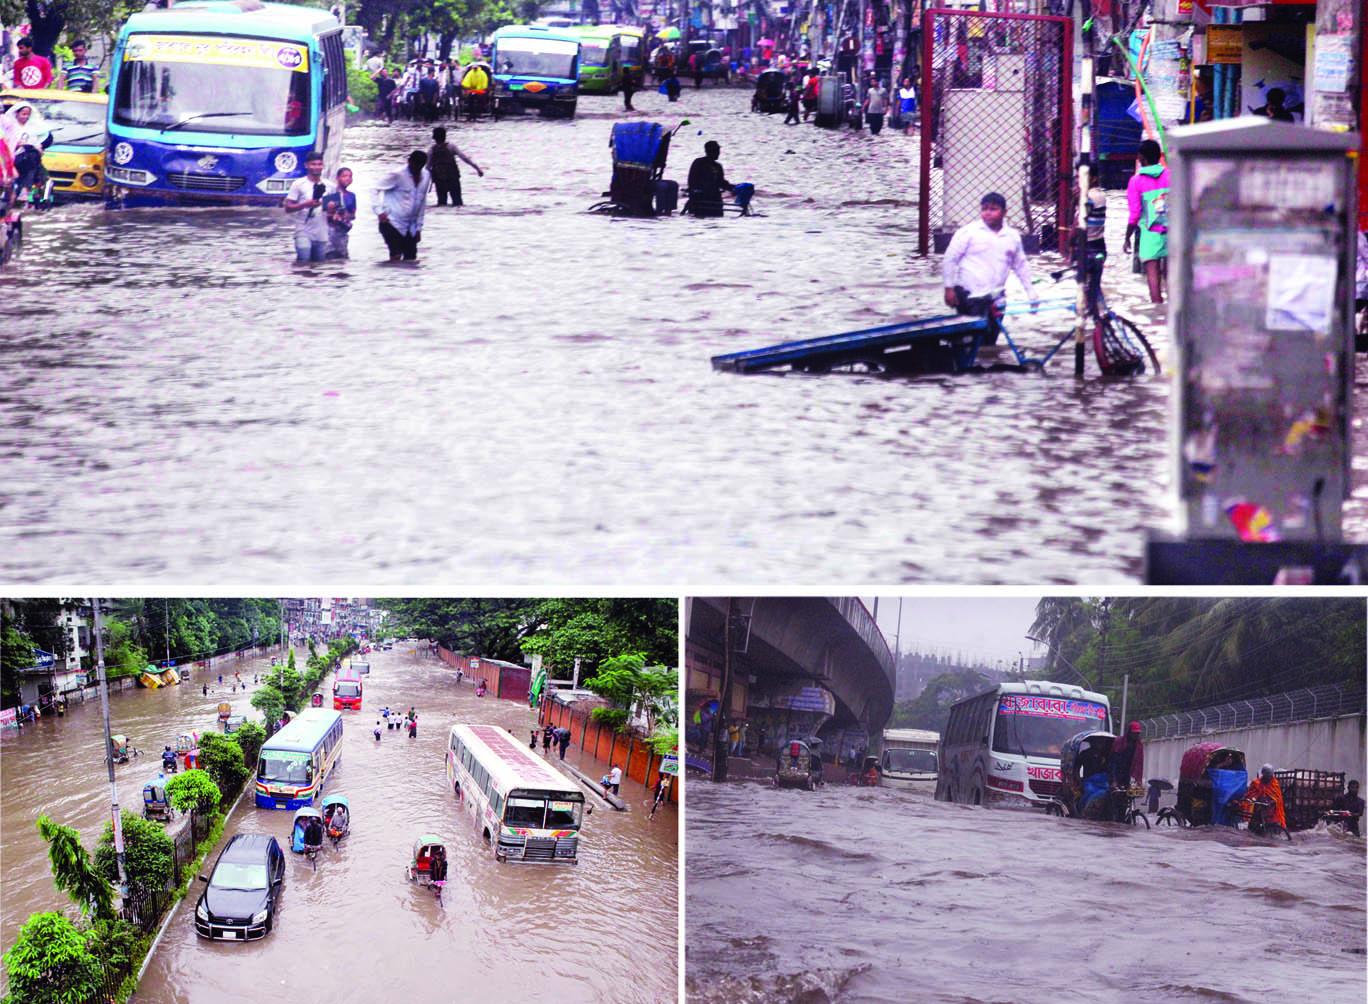 Rains cripple life in city, elsewhere